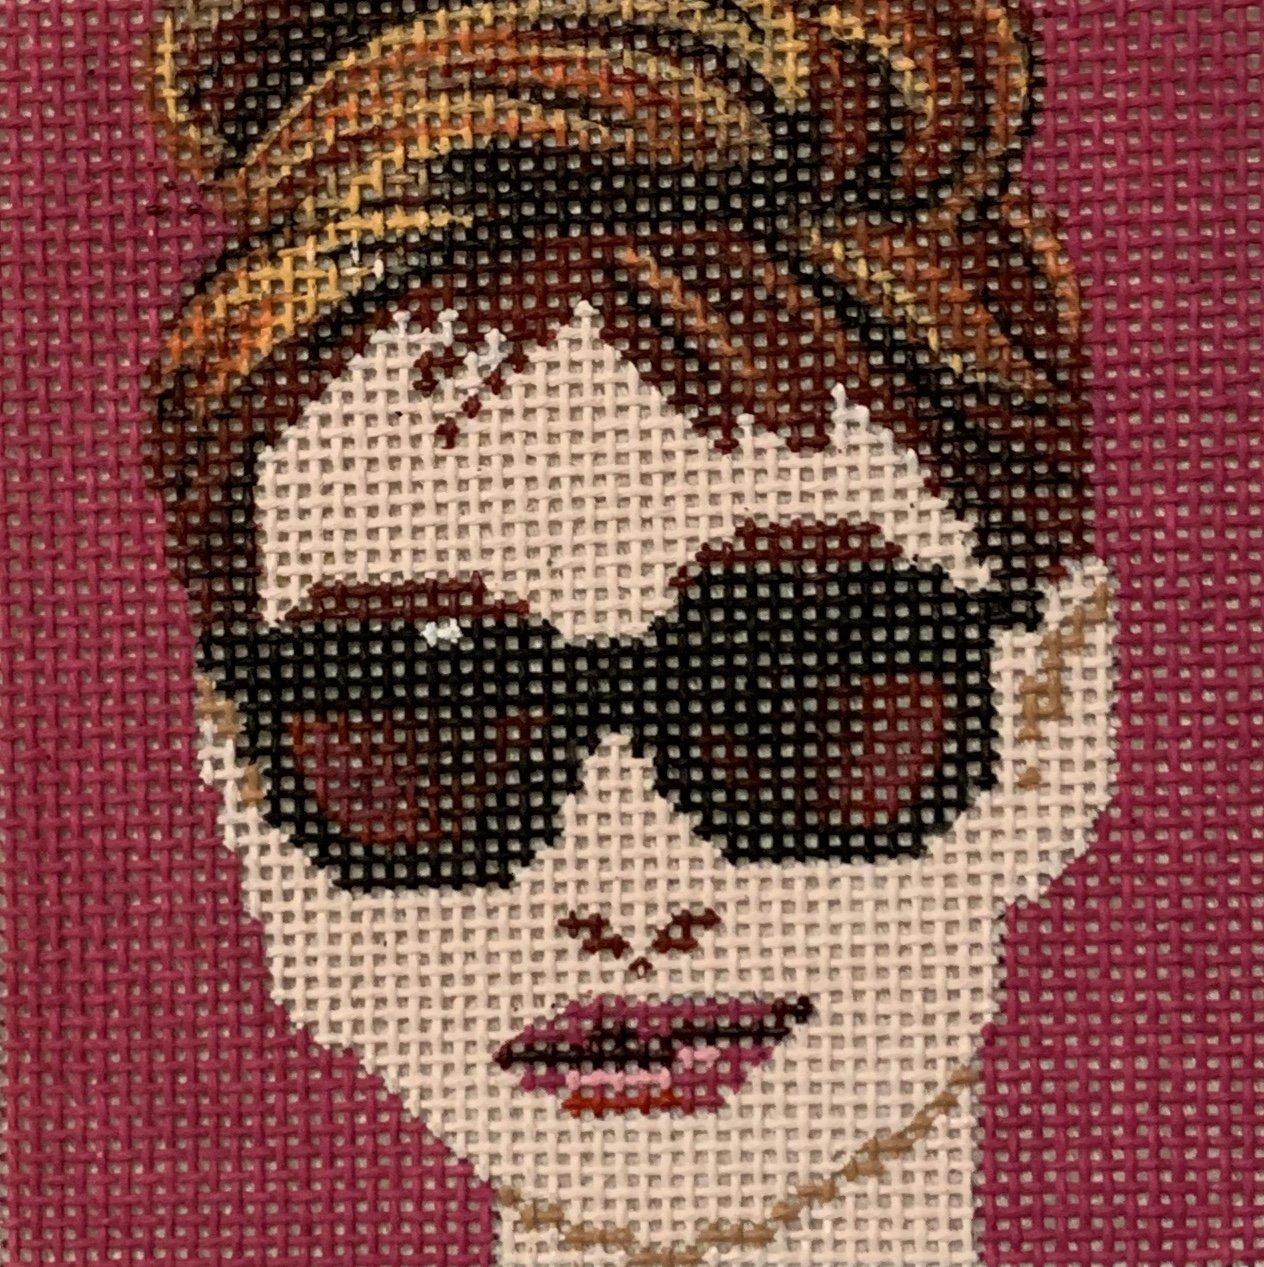 Hepburn - Shades Insert